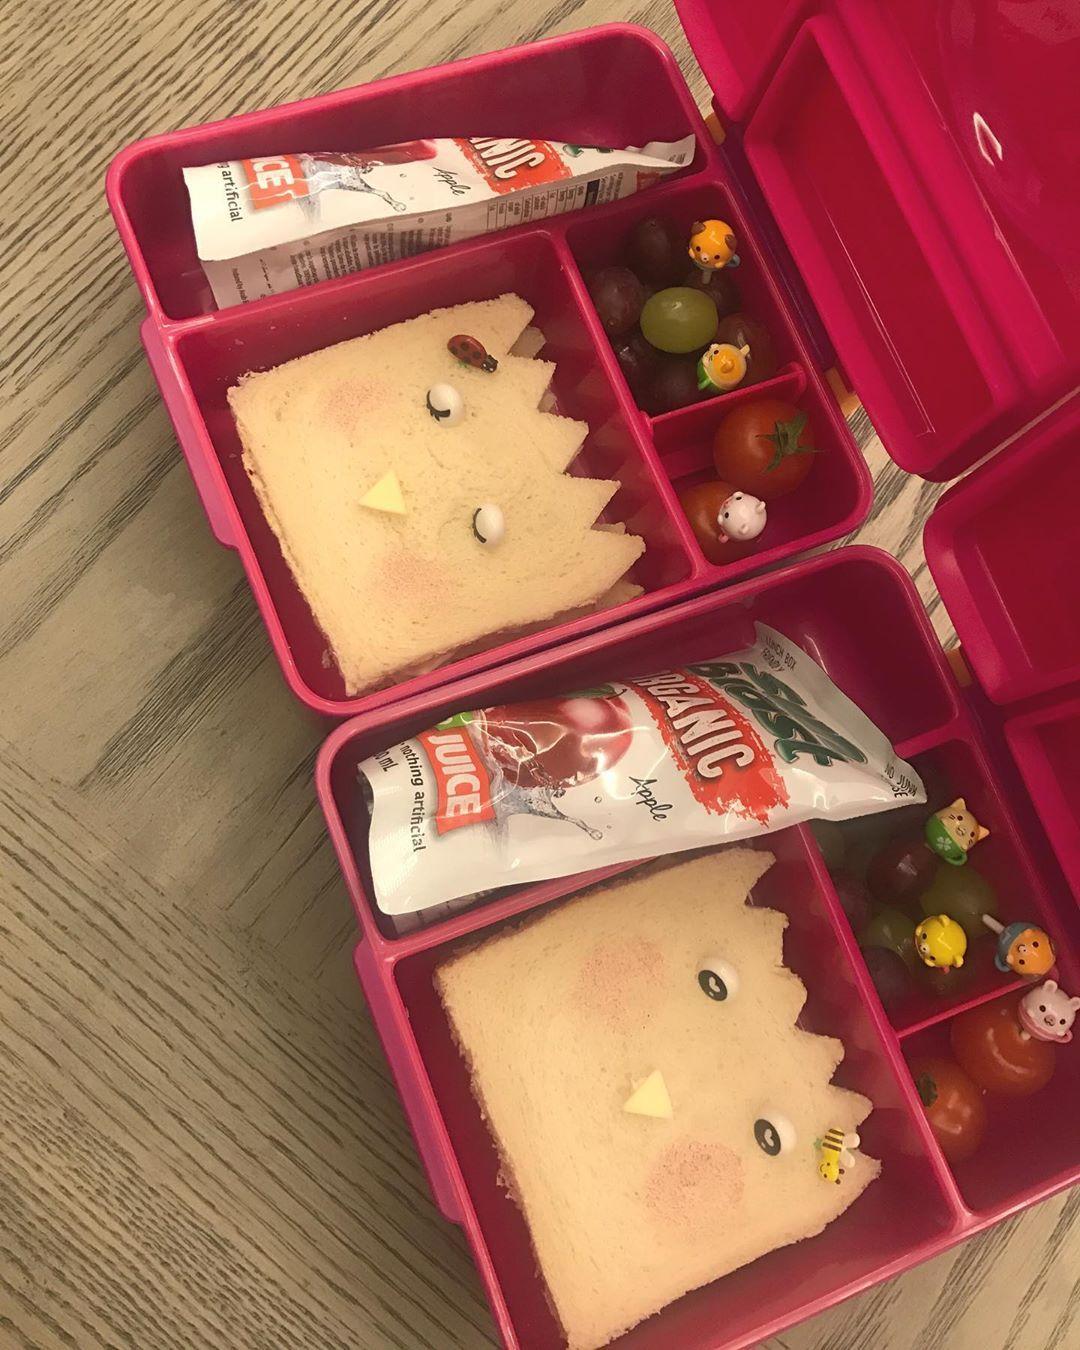 Lunch Box On Instagram صباح الخير بتكلم لكم اليوم عن موضوع استغرب منه وهو لما ادخل حسابات امهات واشوف التعليقات على اللنش بوك Lunch Box Idea Lunch Box Kids